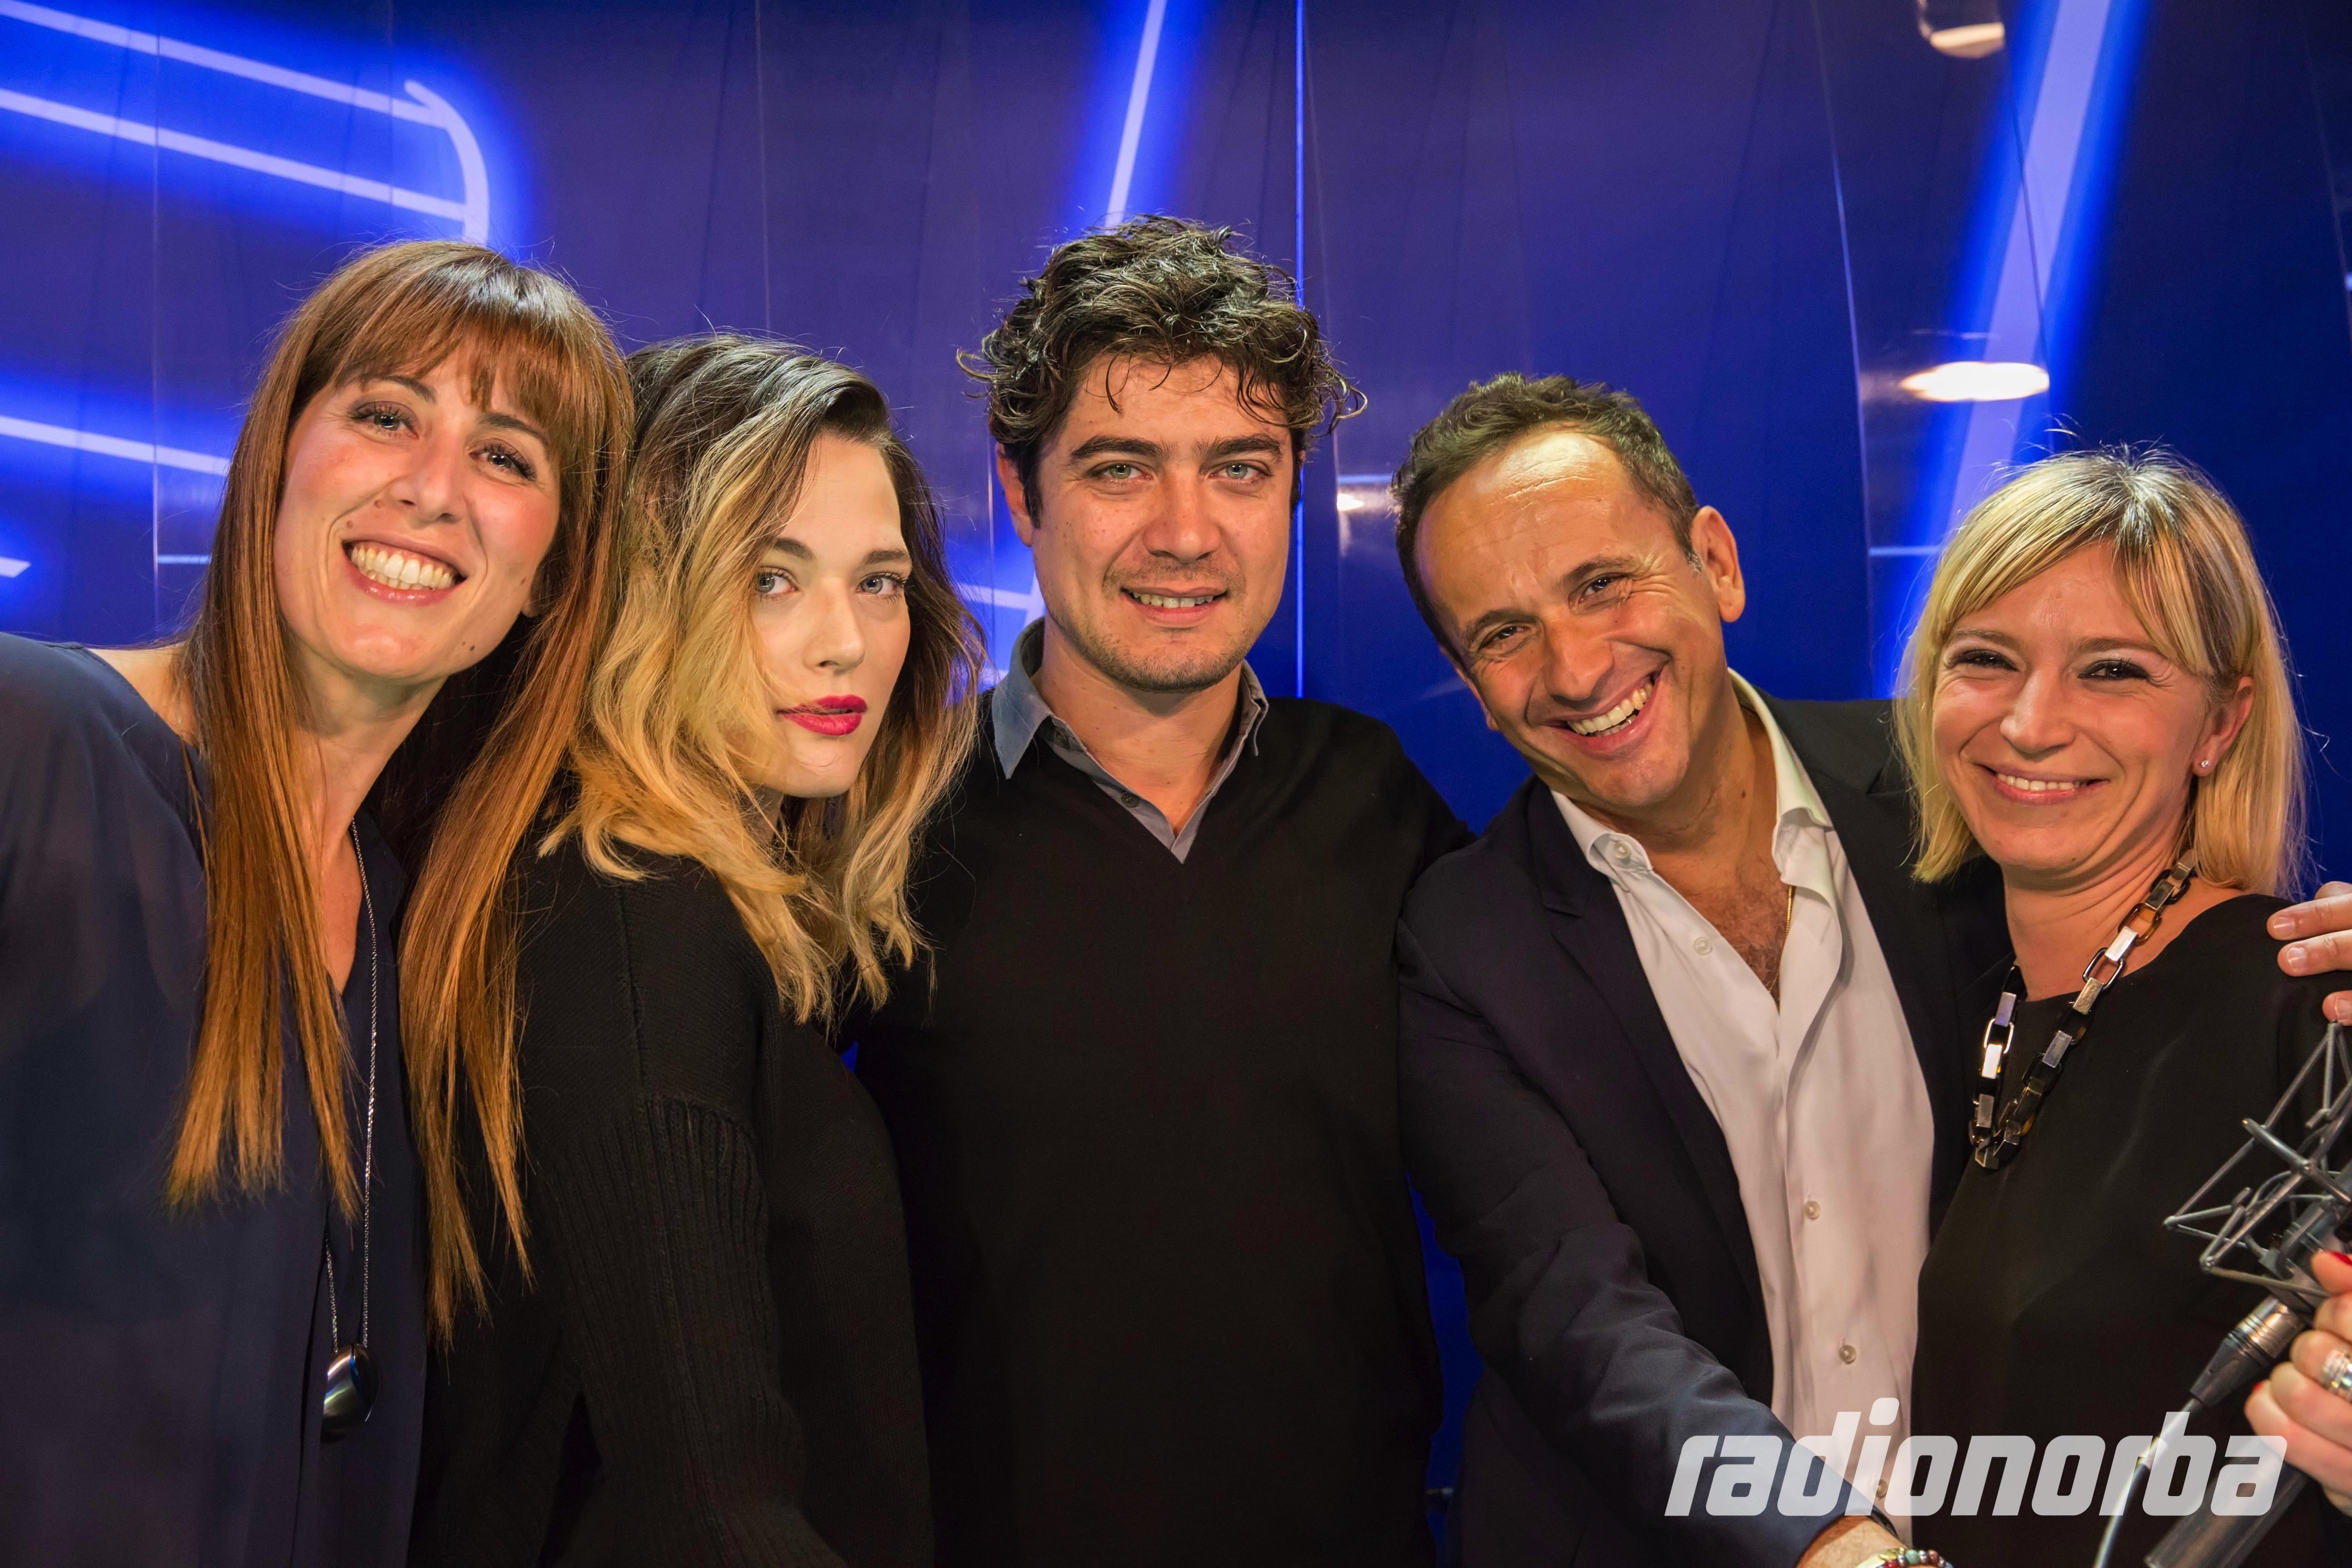 Cena Di Natale Film.Cinema La Cena Di Natale Arriva Su Radionorba Radionorba